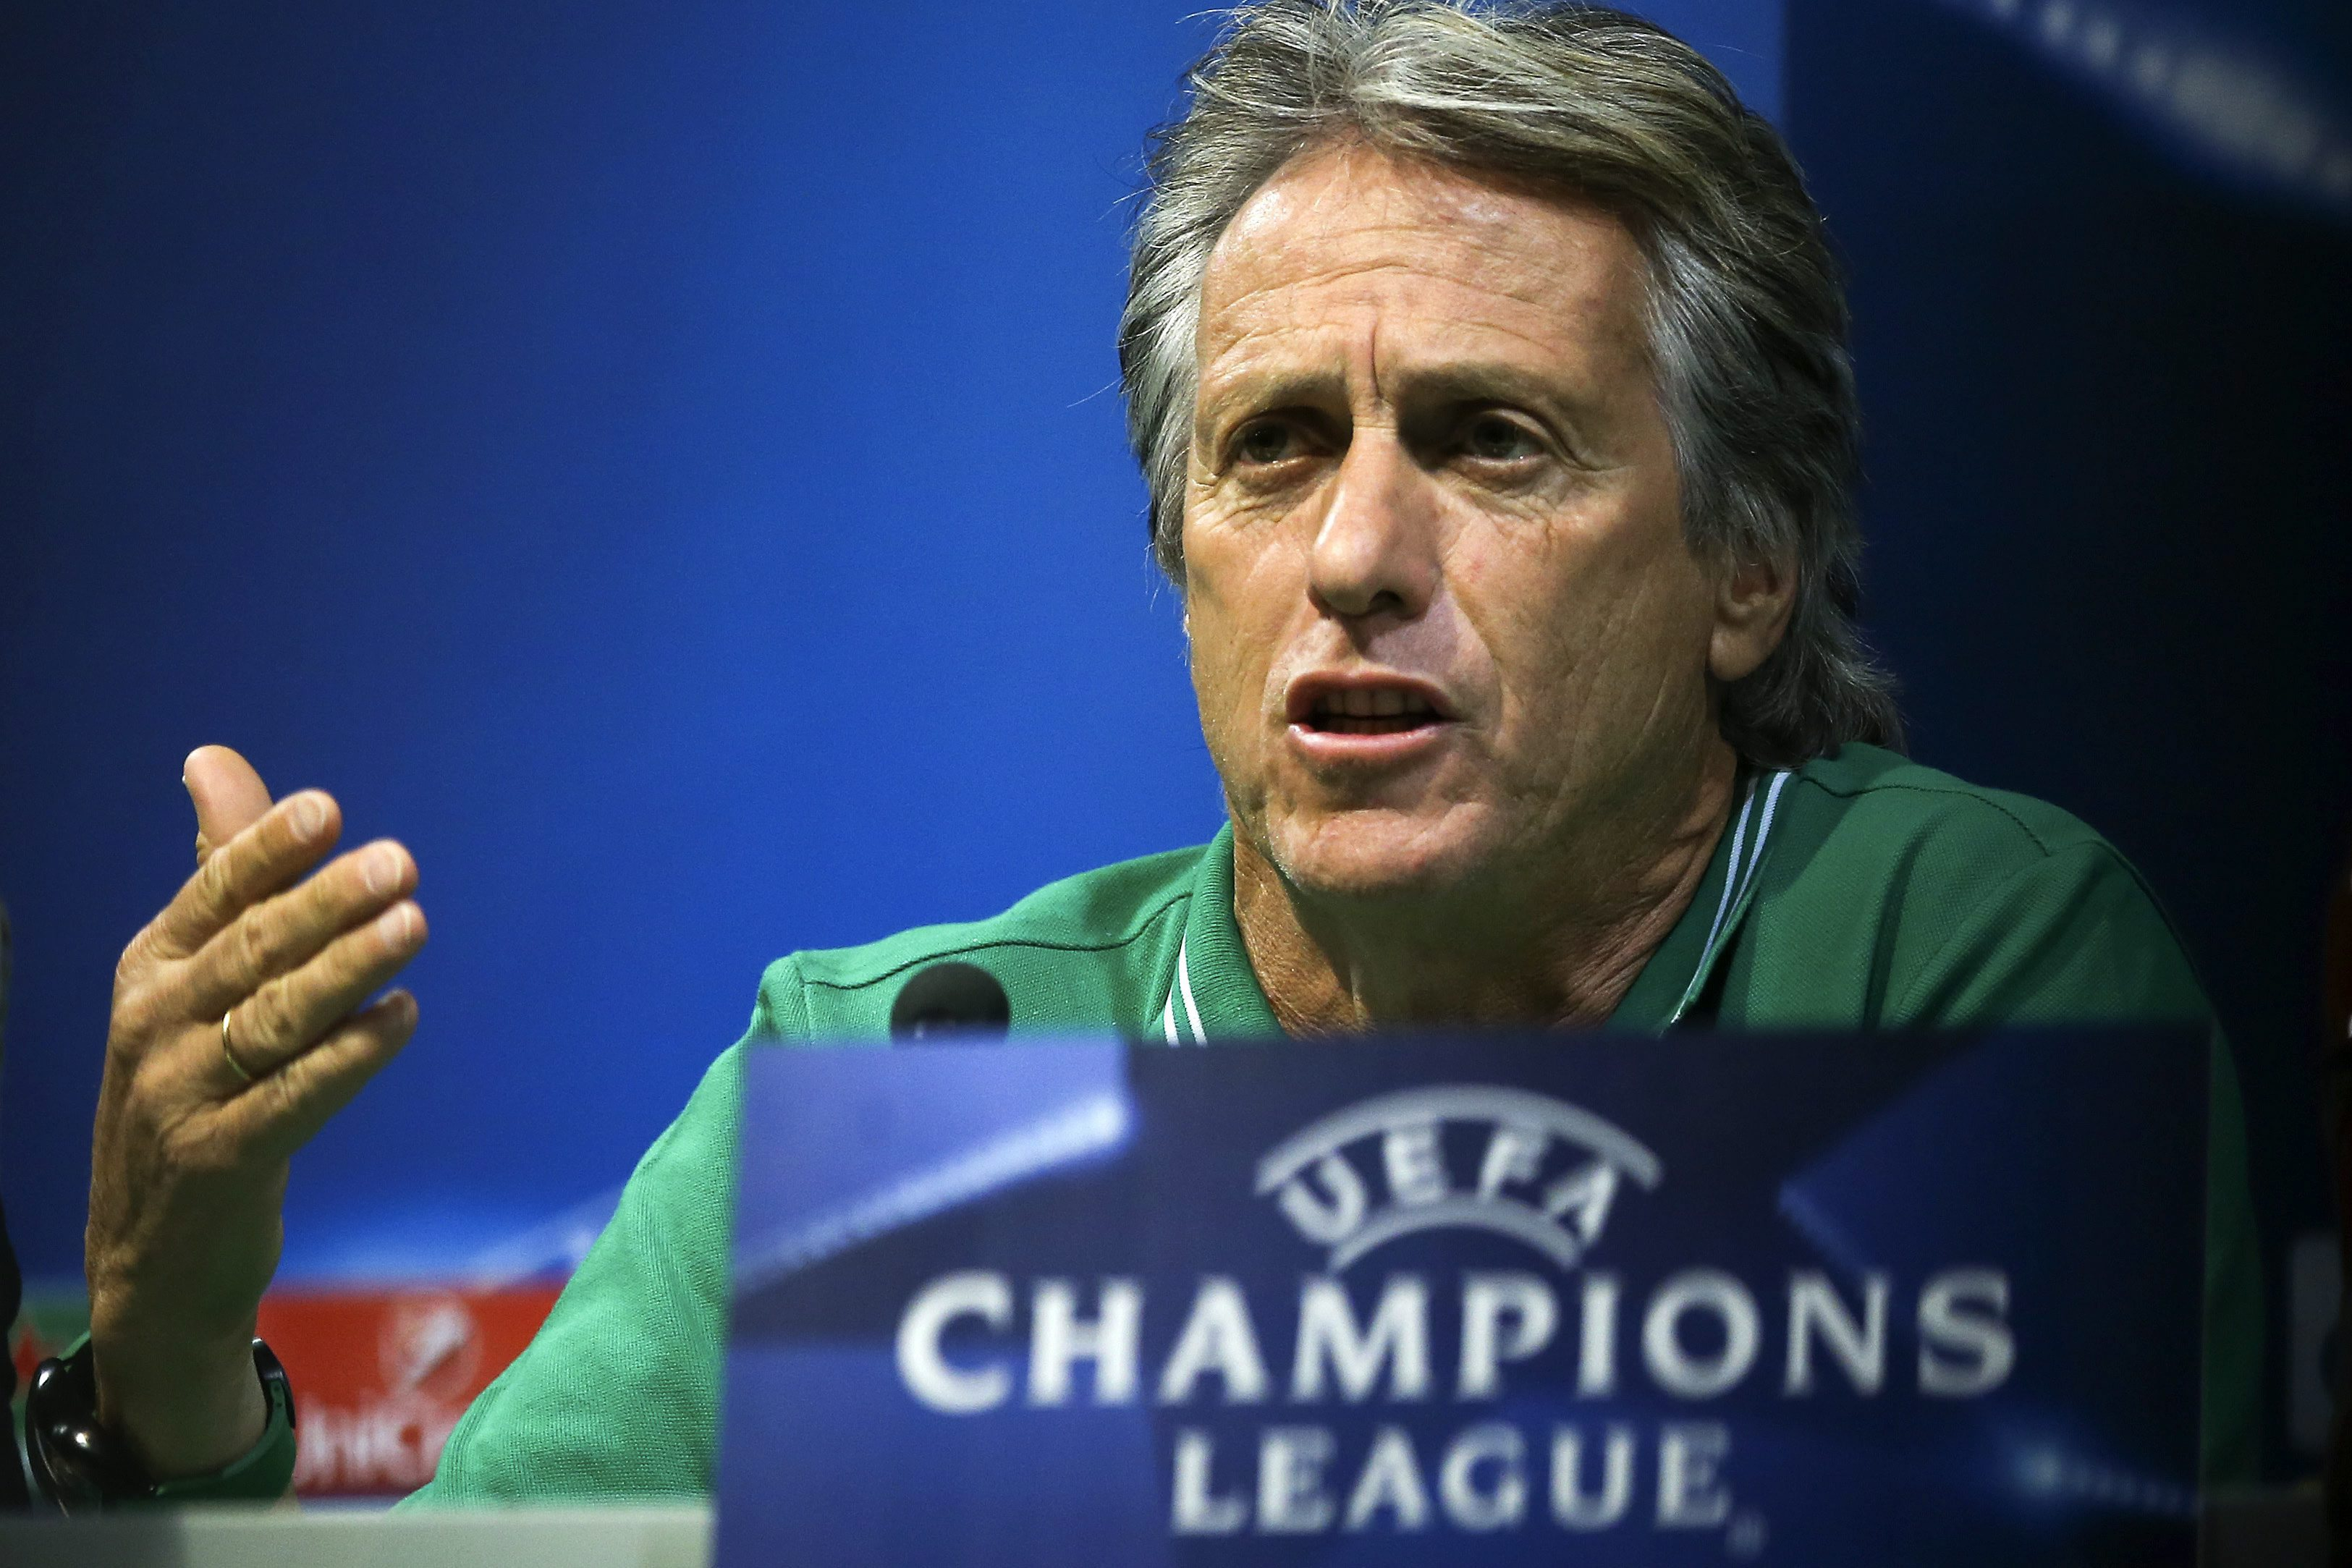 Sporting e FC Porto à procura da primeira vitória na 'Champions'